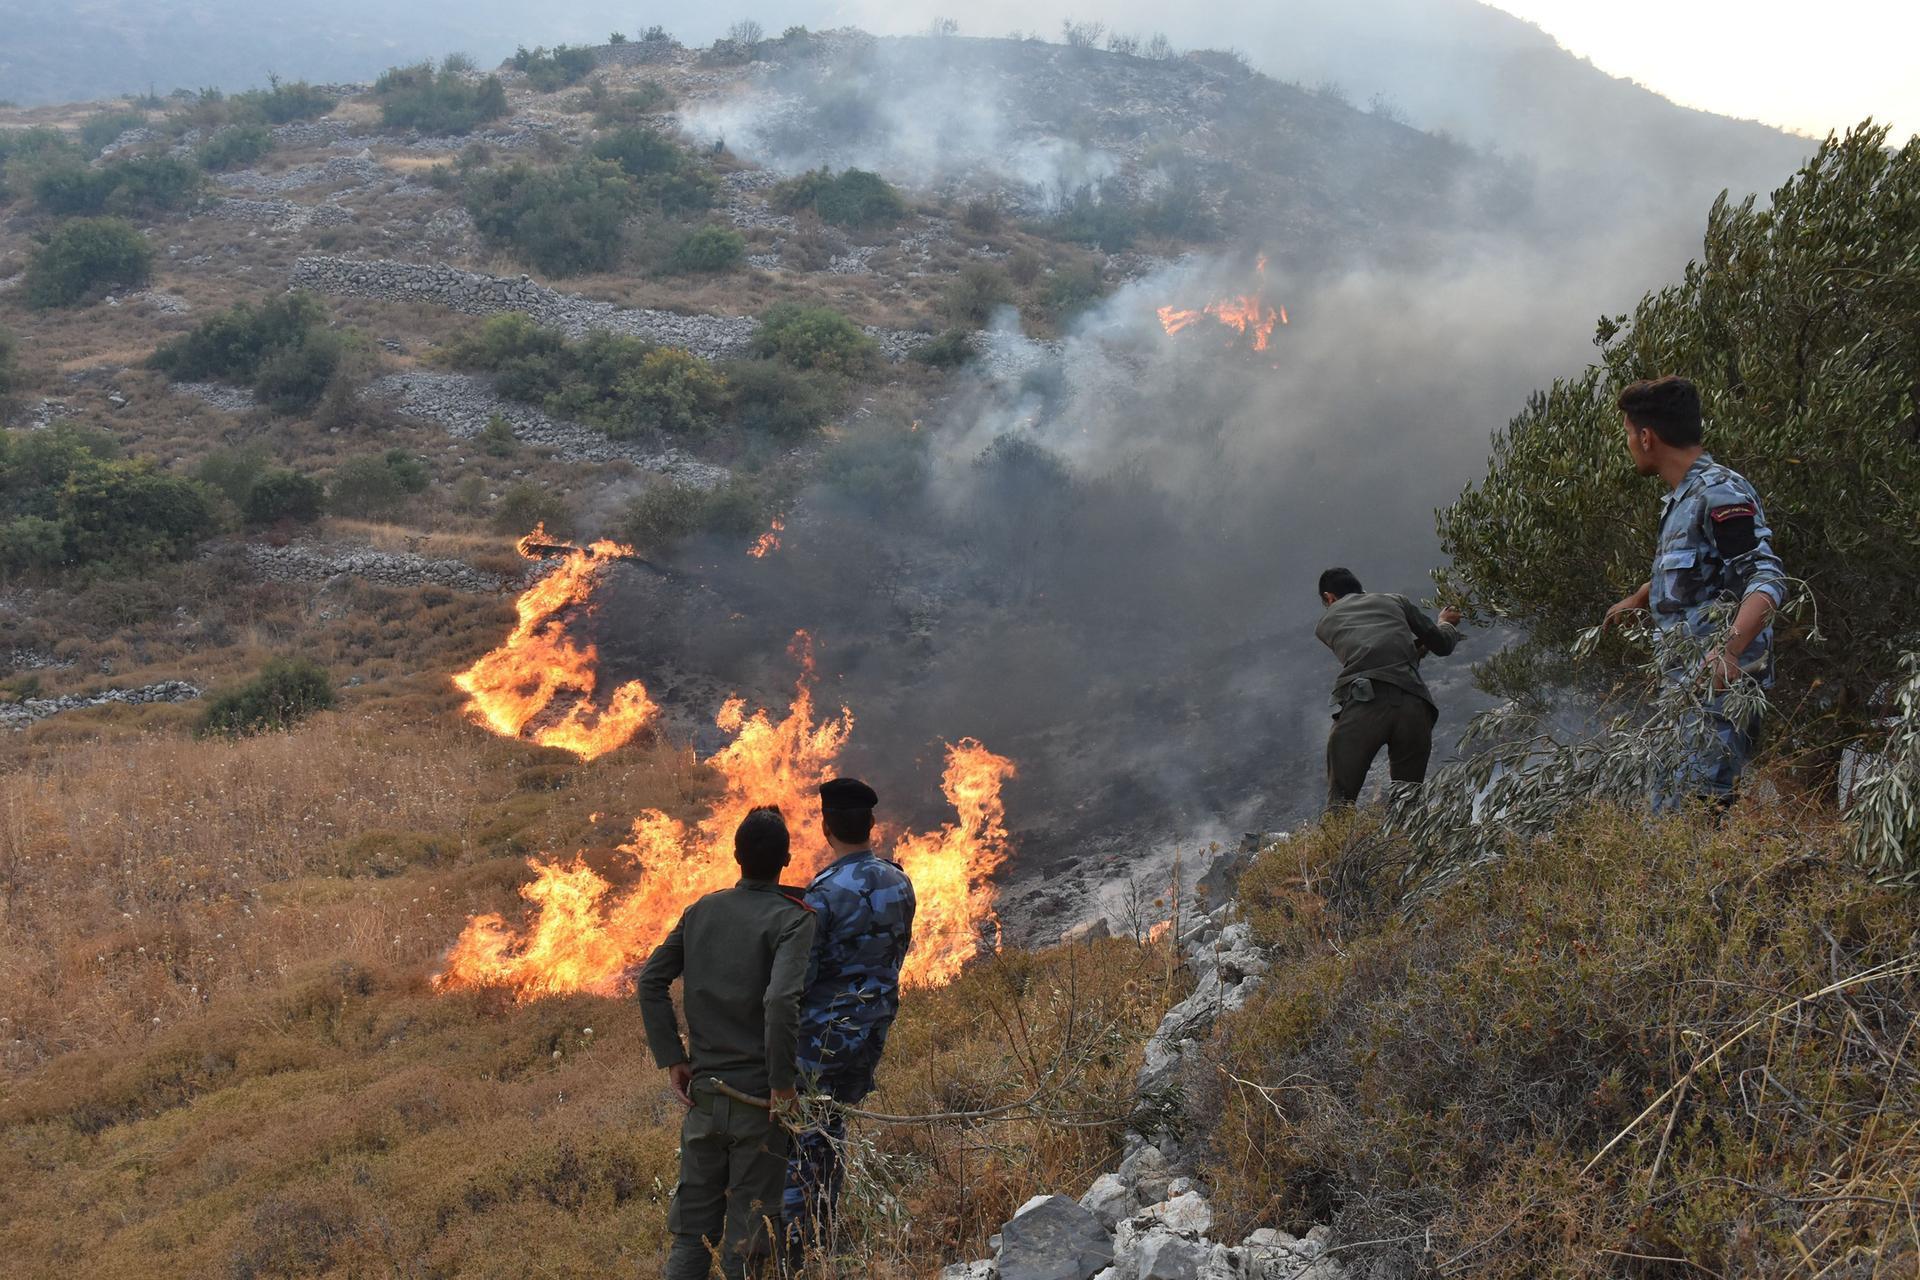 Syria: When war meets bushfires